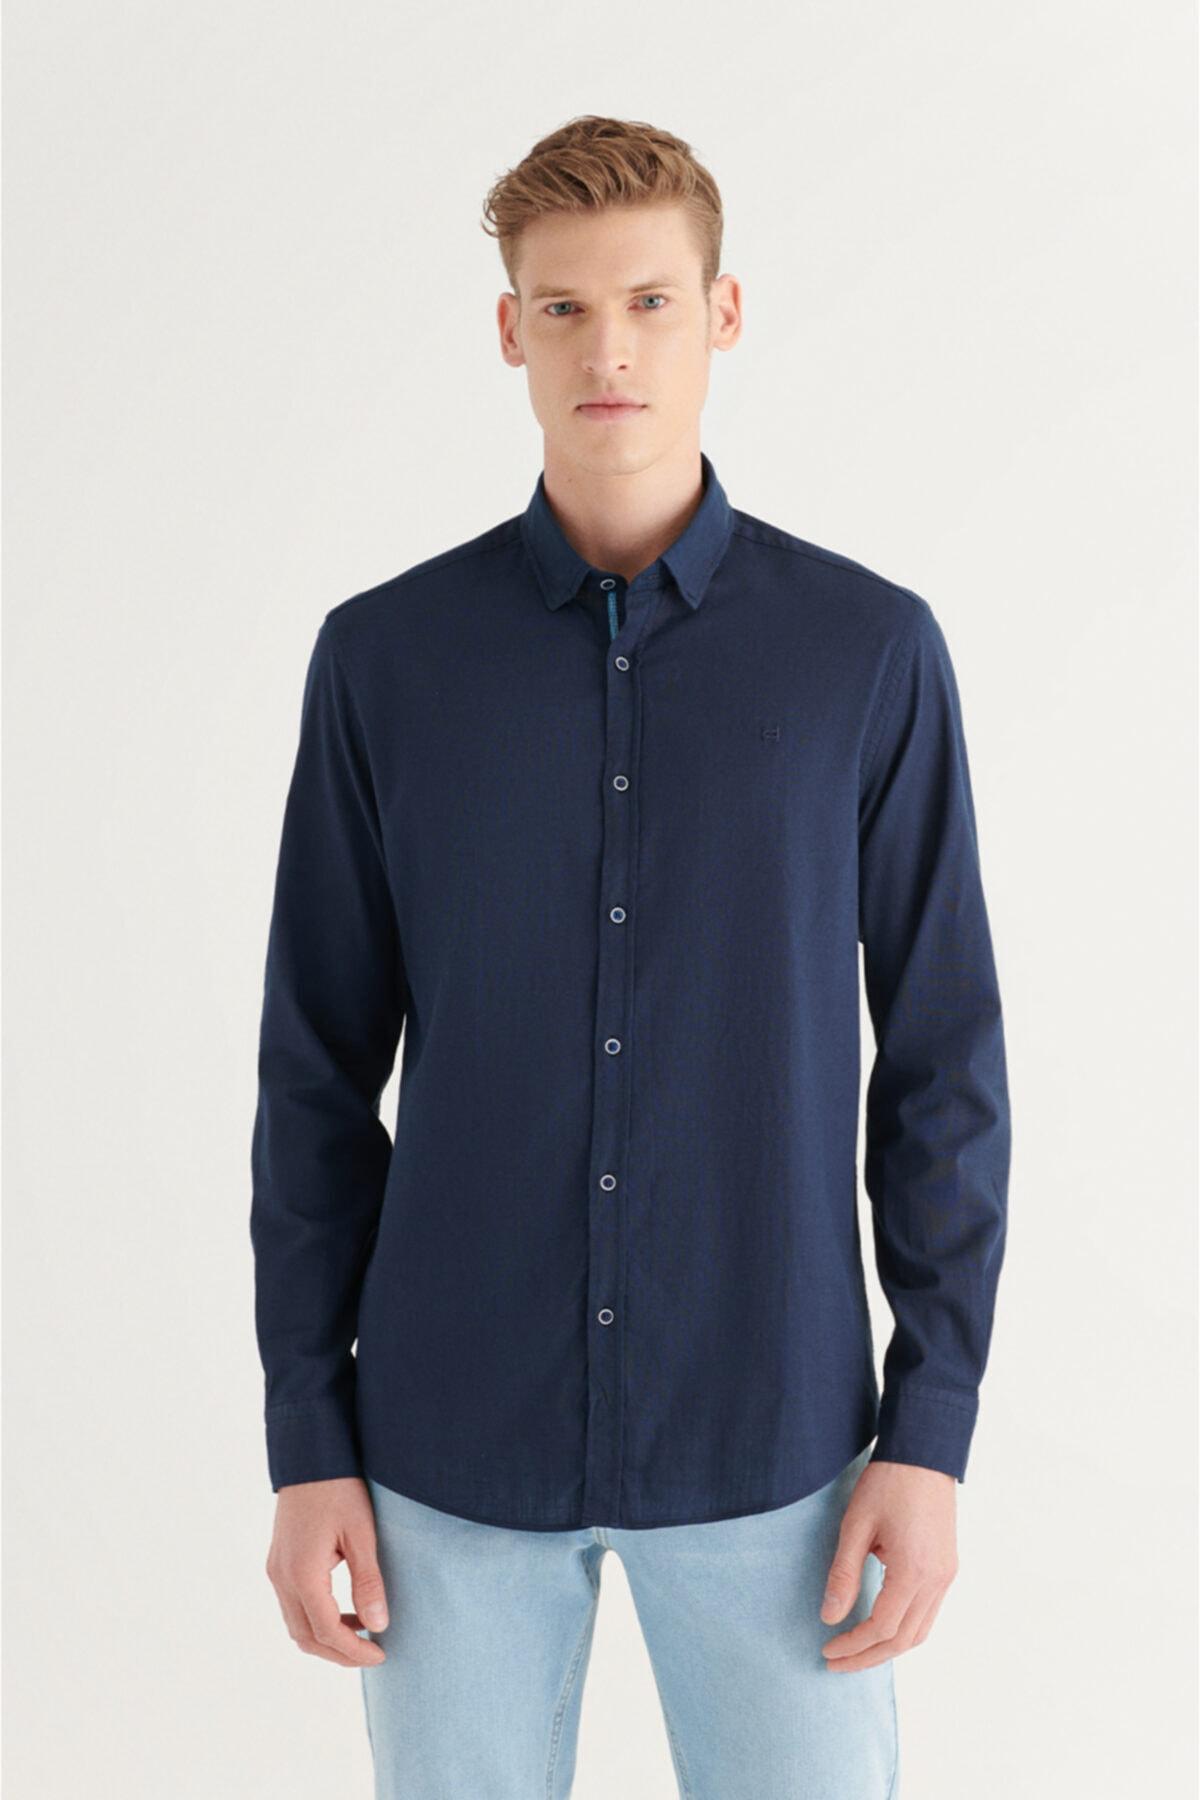 Erkek Lacivert Düz Alttan Britli Yaka Regular Fit Gömlek A11y2141